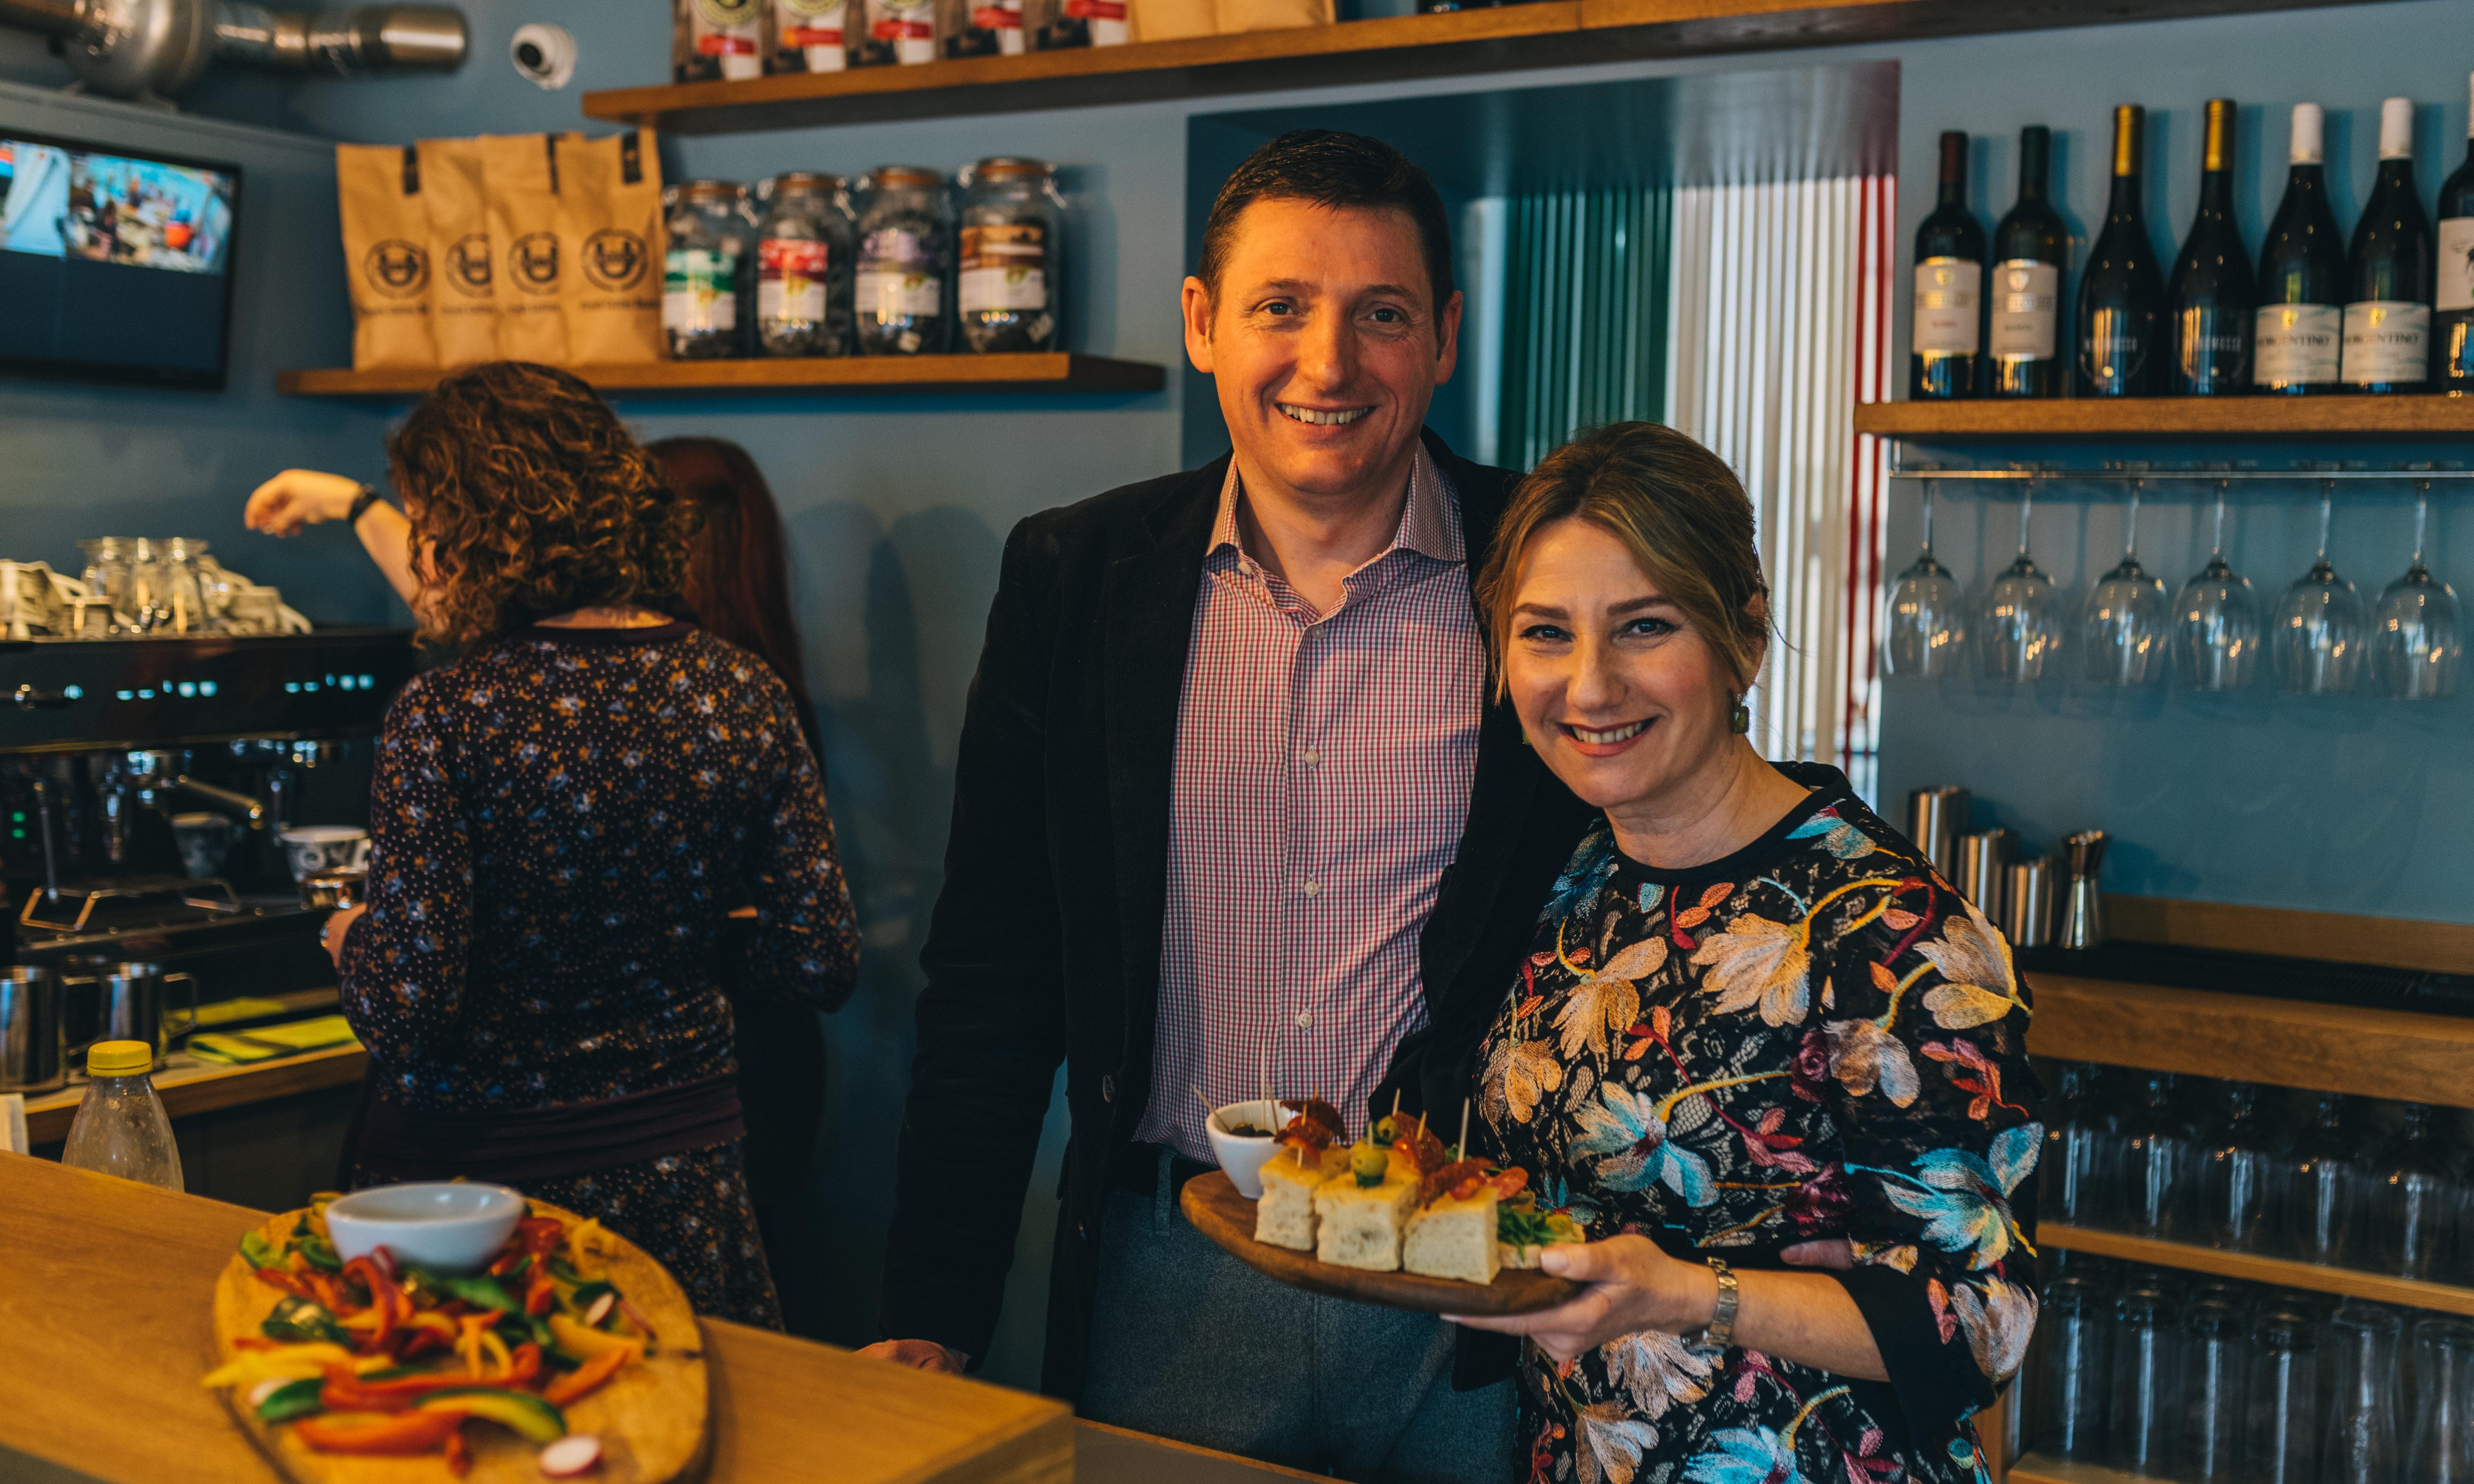 La Sicilyana's Laura Raimondi with husband and business partner Steven Dalton.